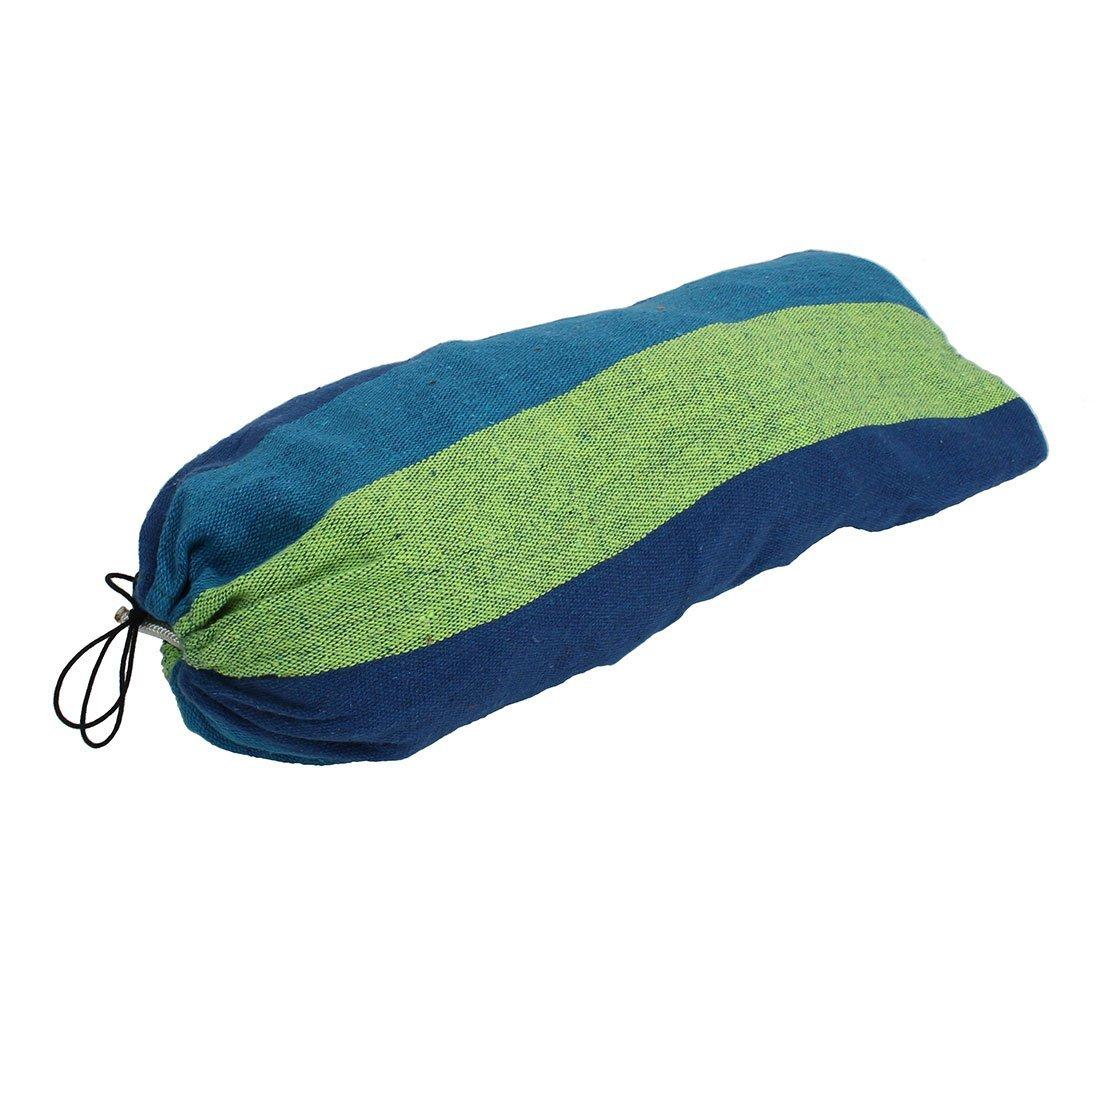 DealMux lona al aire libre Camping Viagem baloiço de corda de suspensão dormir cama de Casal paracaídas hamaca: Amazon.es: Hogar